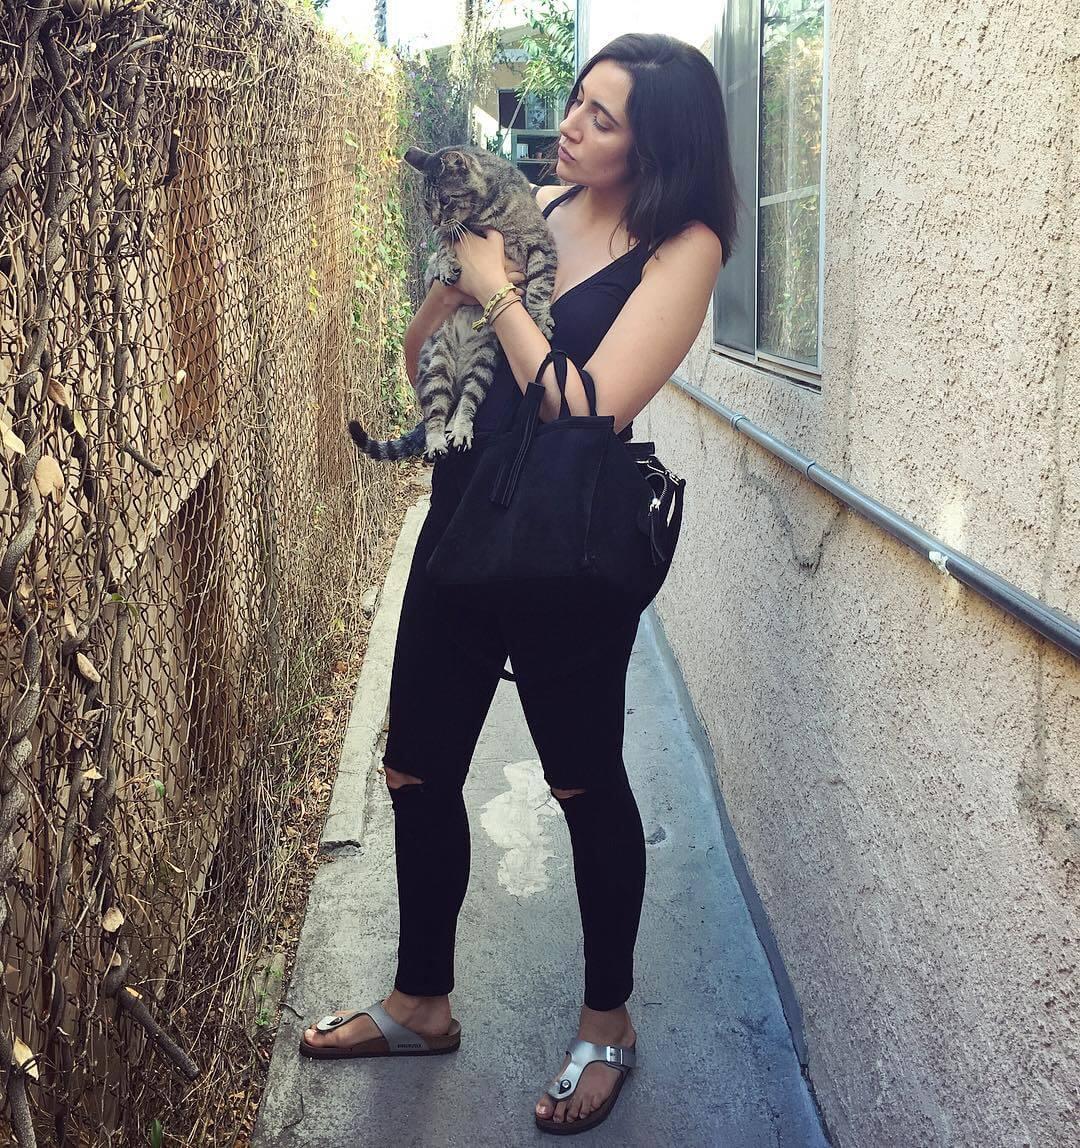 Safiya Nygaard hot side pics